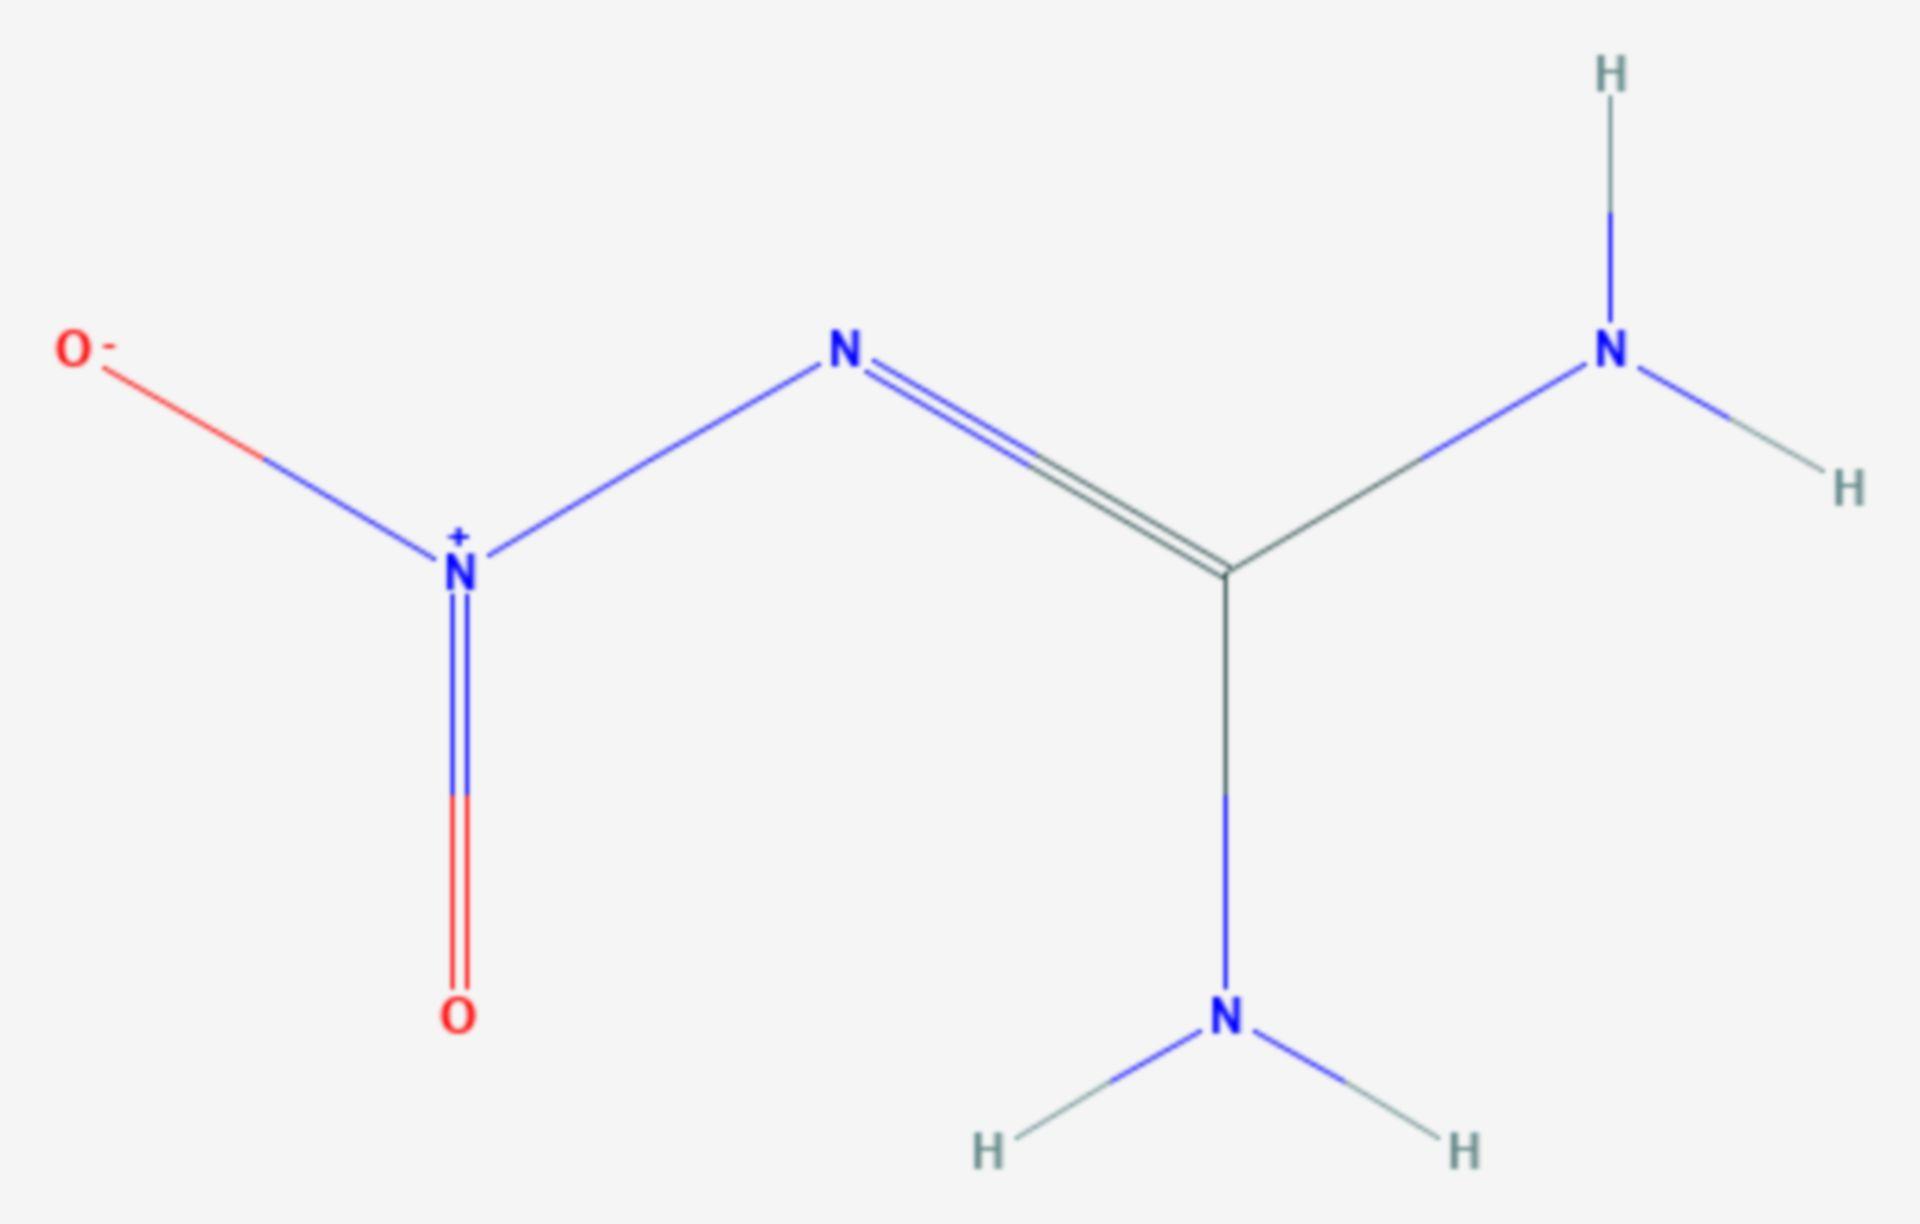 Nitroguanidin (Strukturformel)